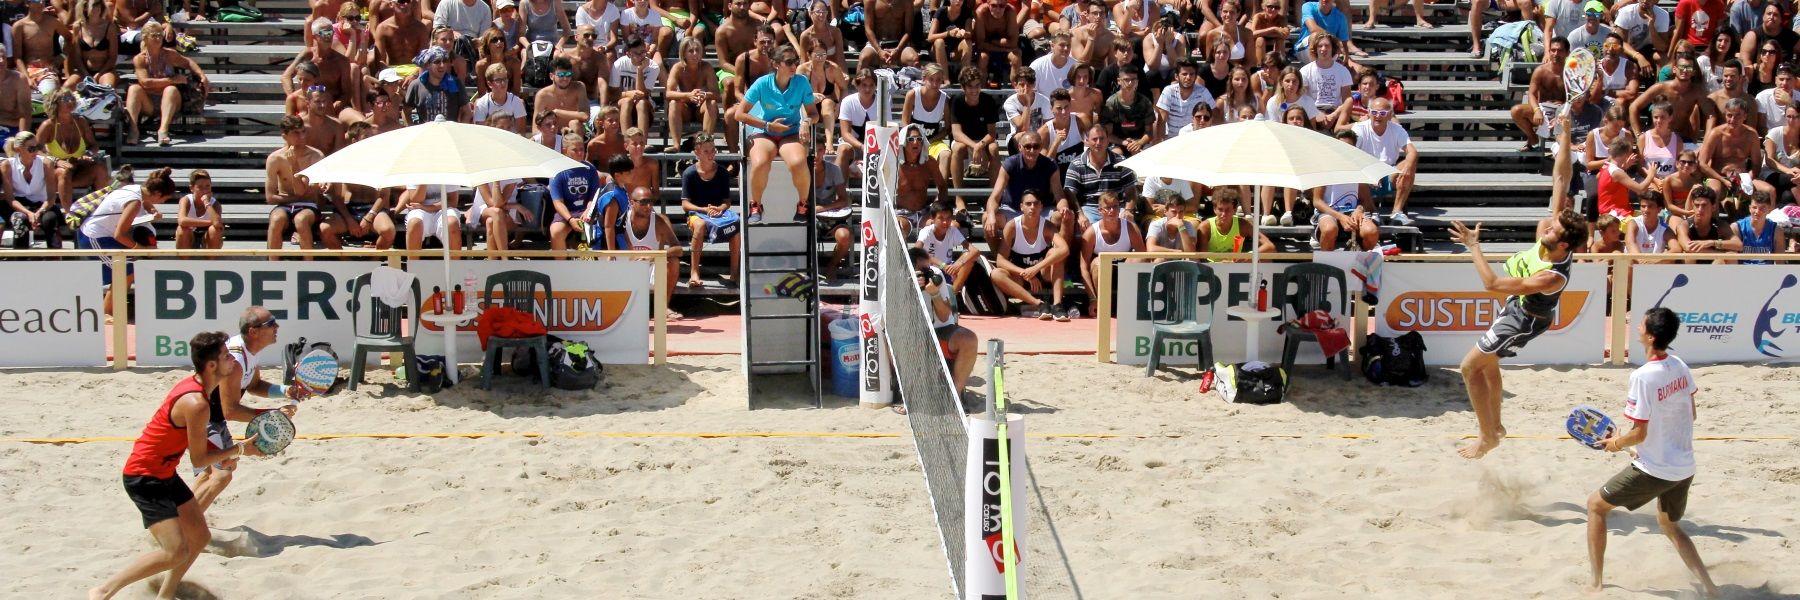 ITF Beach Tennis World Championship